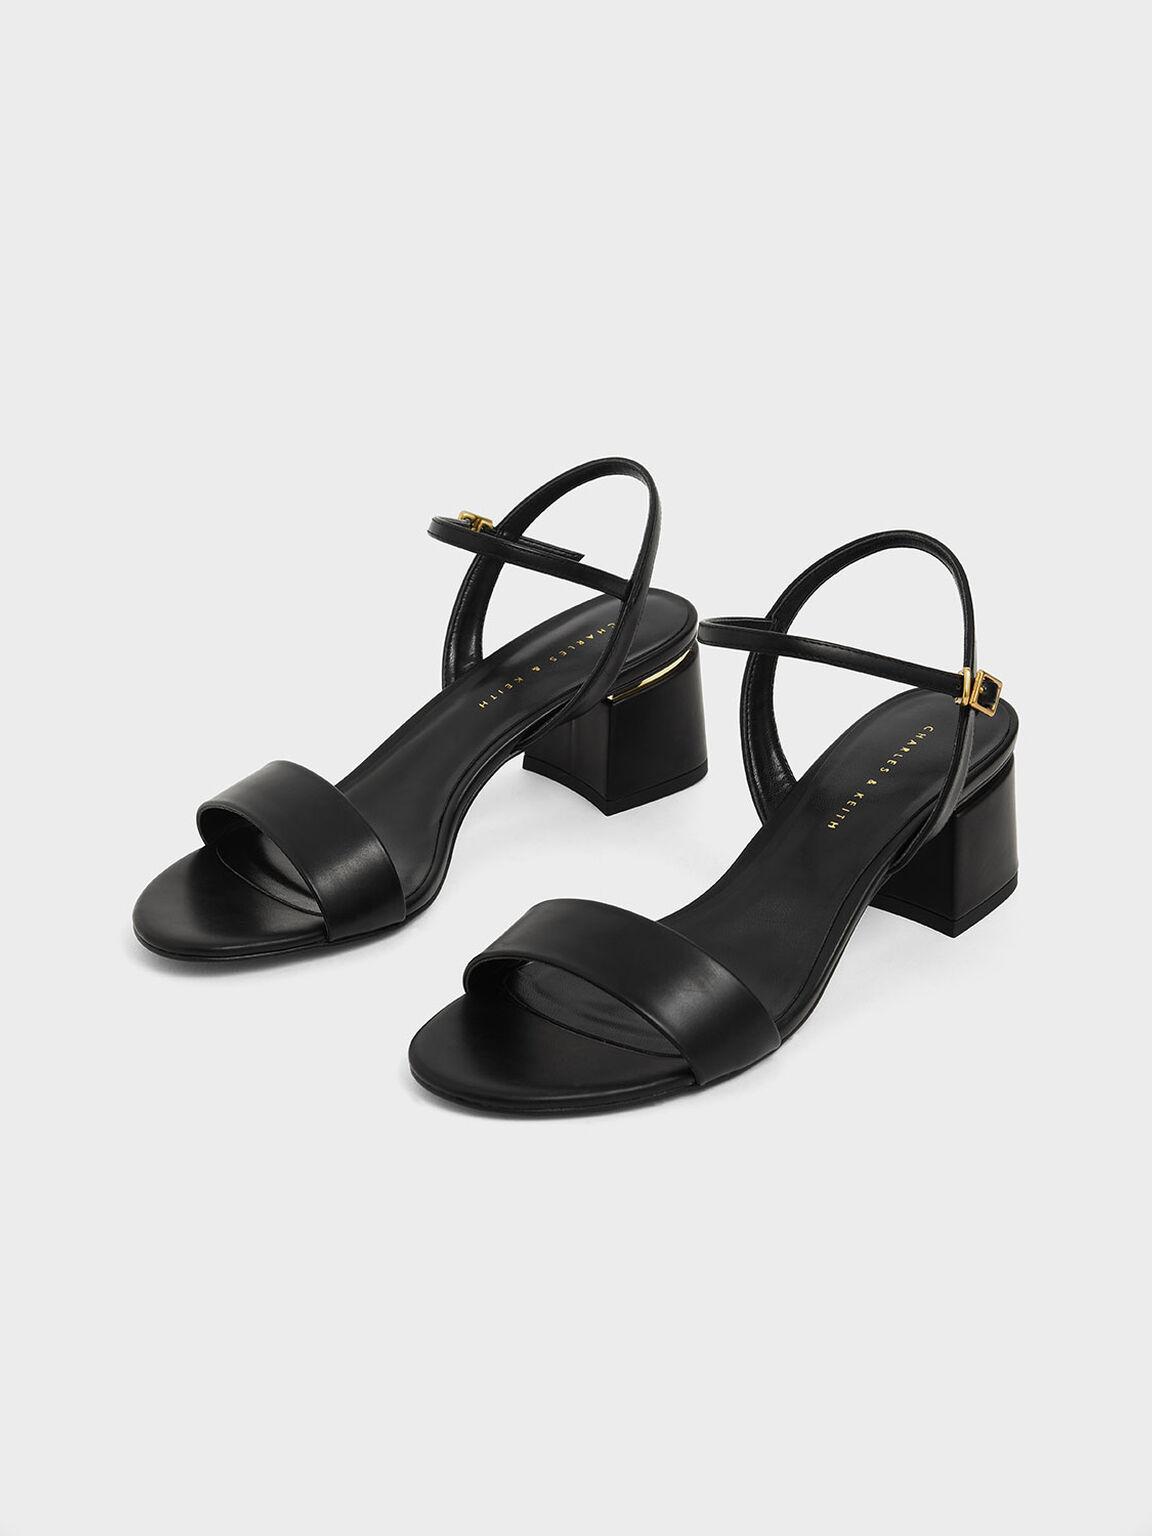 Open Toe Ankle Strap Block Heel Sandals, Black, hi-res